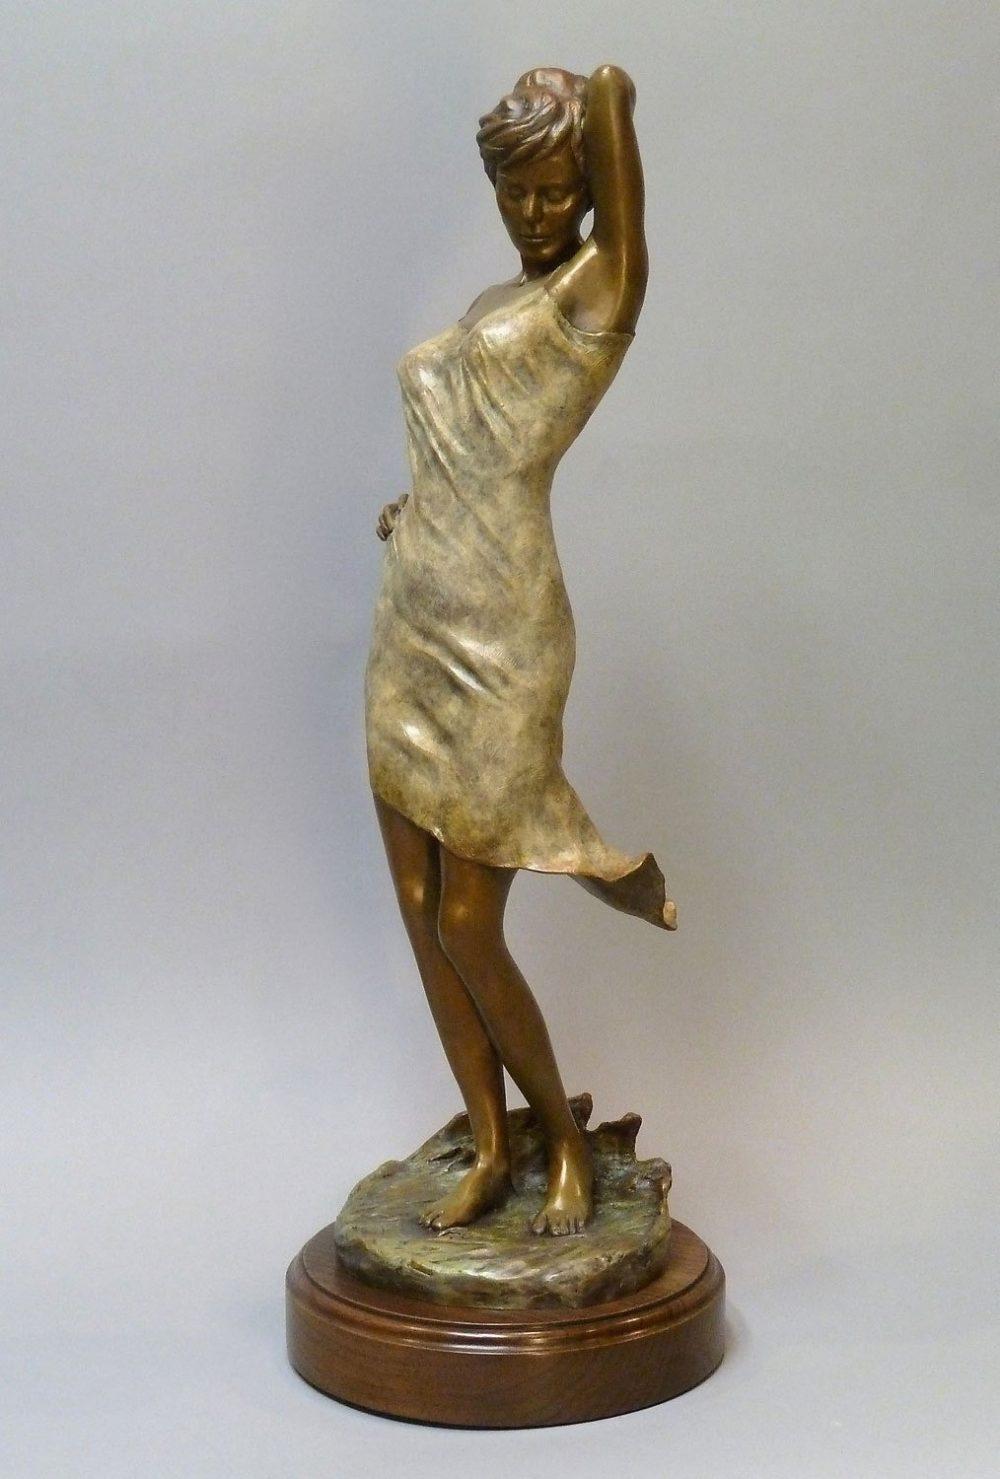 Midnight Breeze   Scy Caroselli   Sculpture-Exposures International Gallery of Fine Art - Sedona AZ